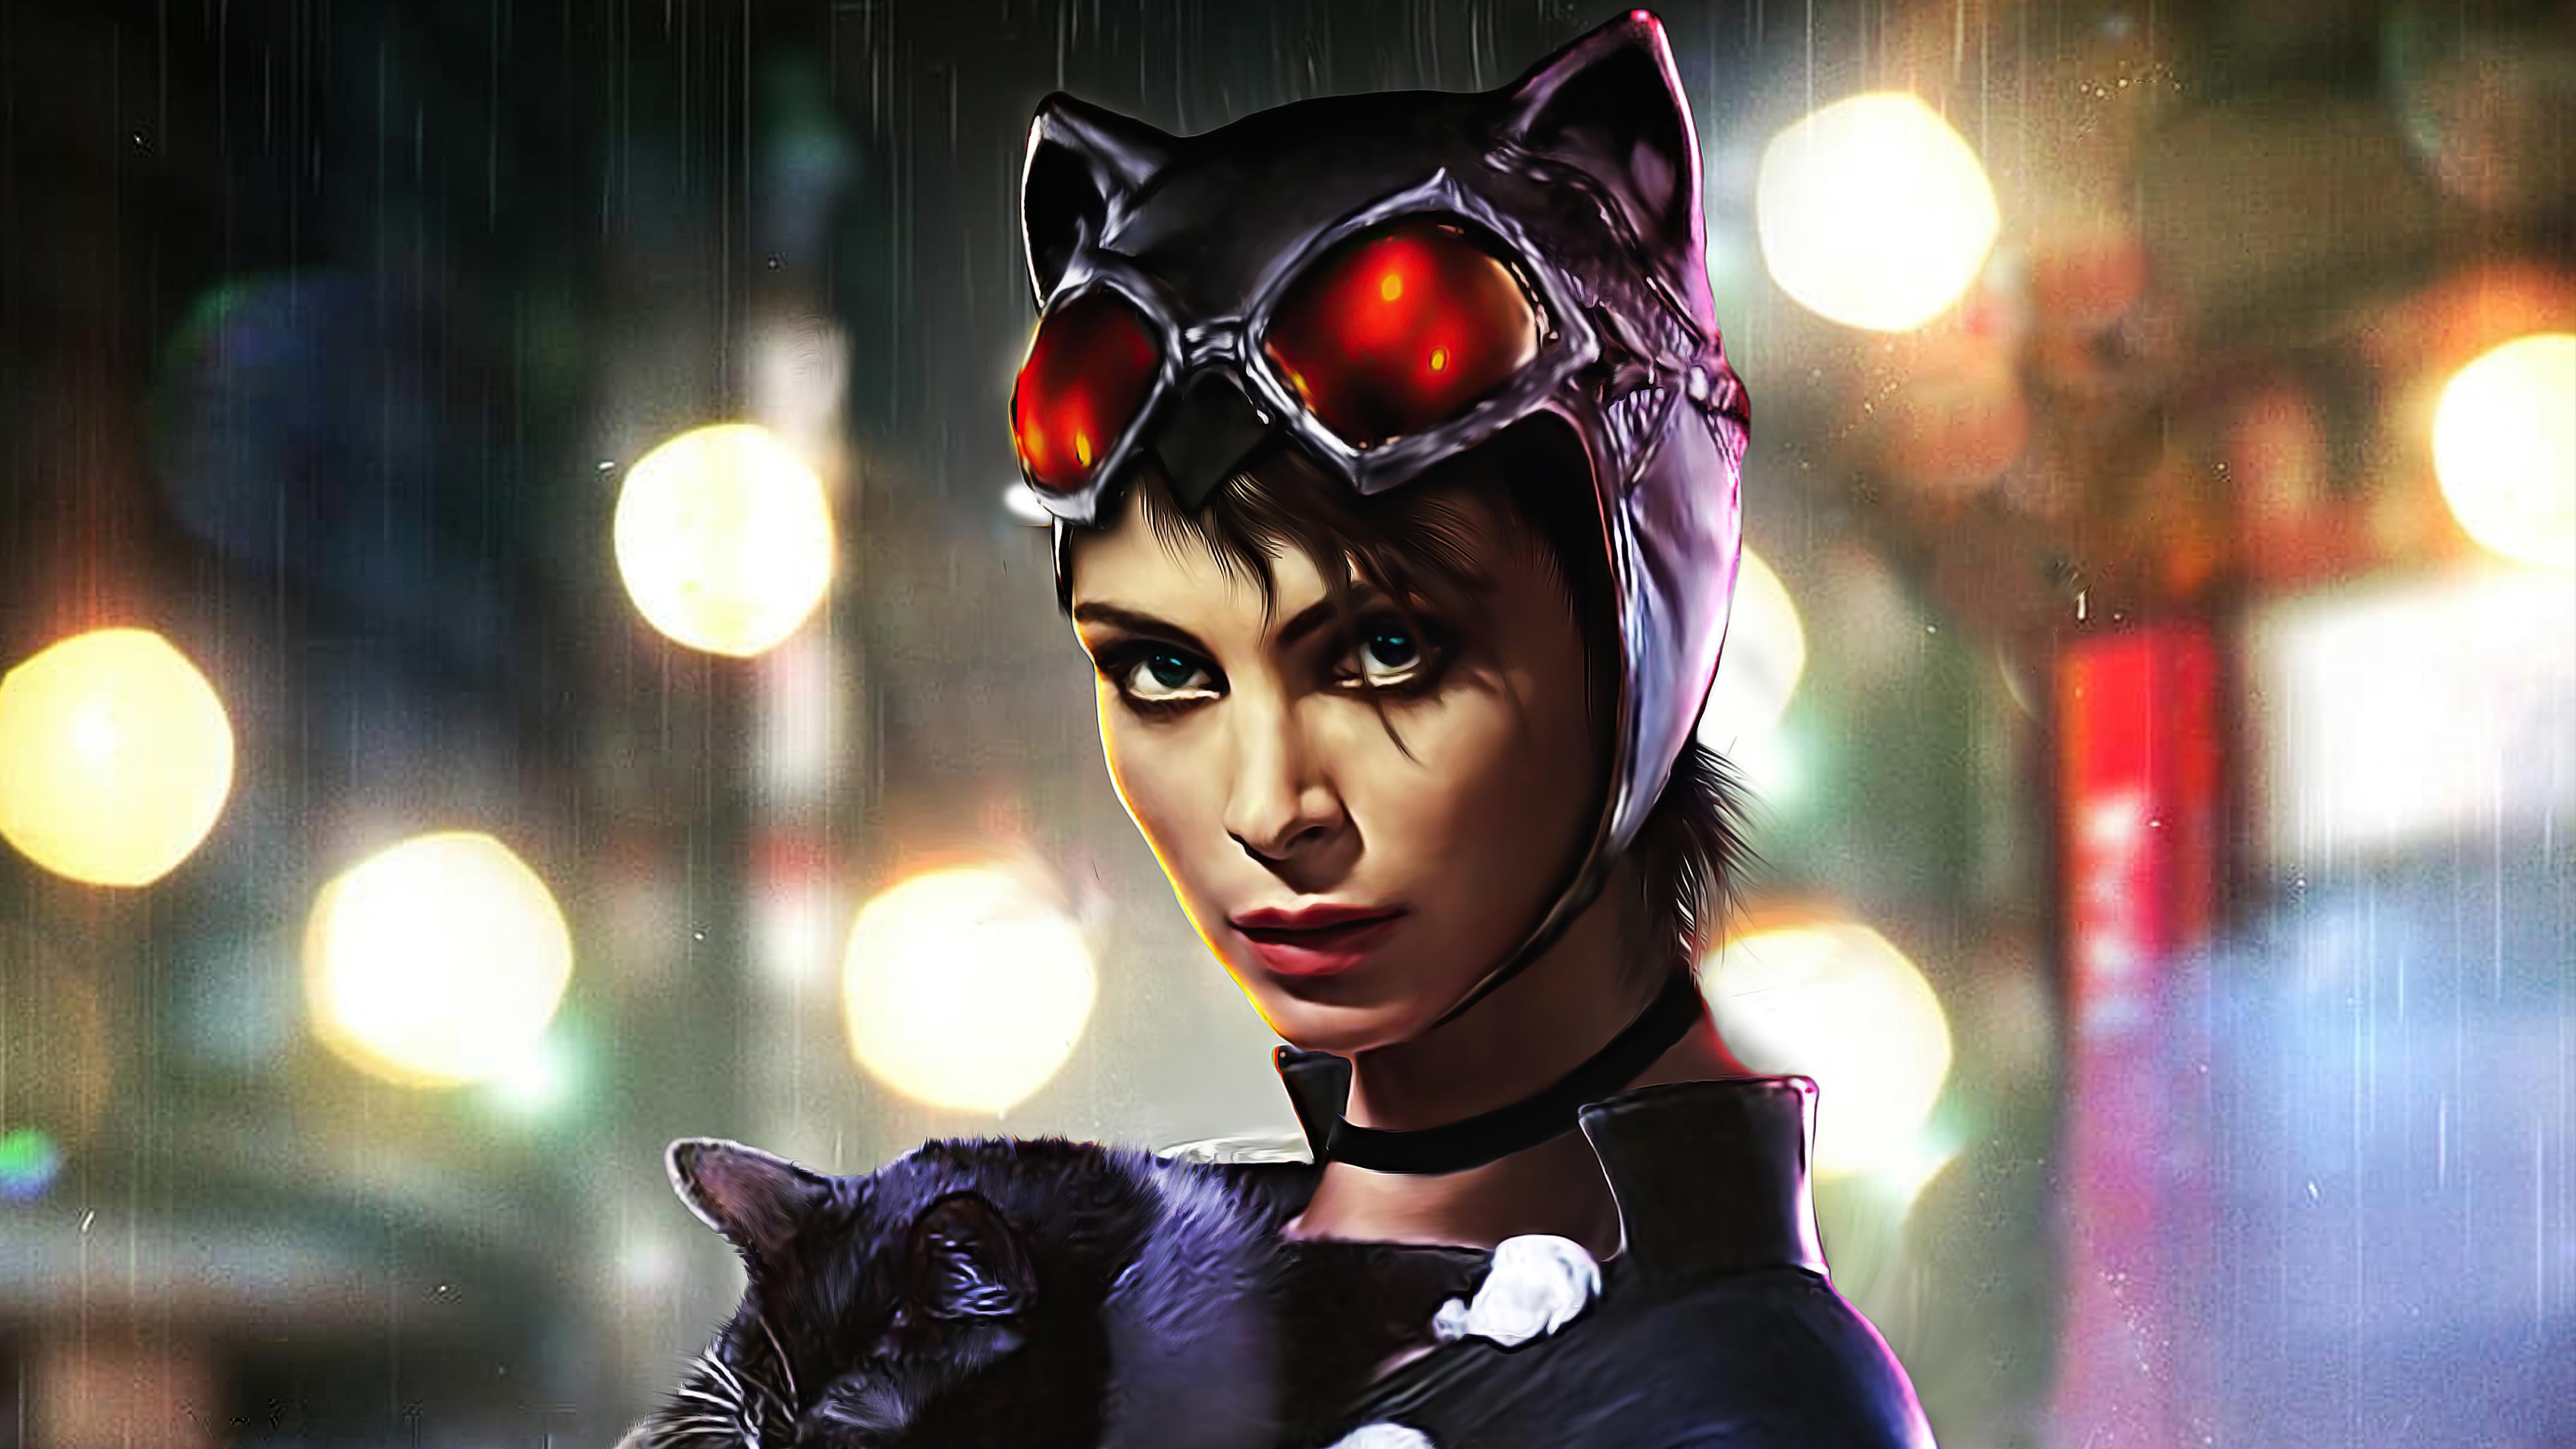 morena baccarin as catwoman 4k 1617446697 - Morena Baccarin As Catwoman 4k - Morena Baccarin As Catwoman 4k wallpapers